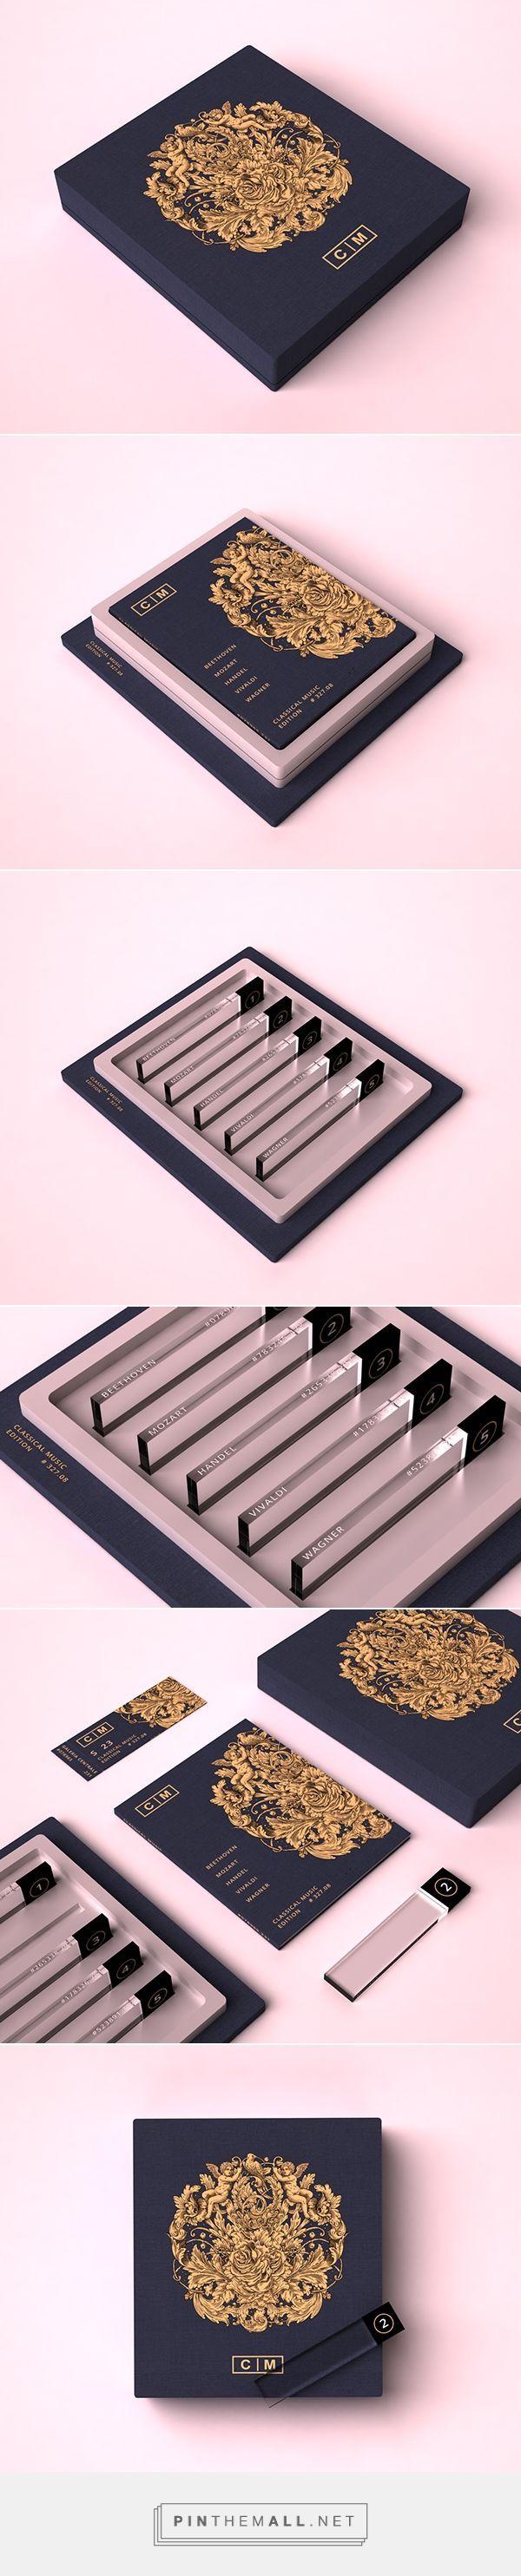 Packaging for a Classical Music Collection -idea memo : 테이크아웃형 or 고도주용 잔술같은 느낌으로 브랜딩하면 어떨까